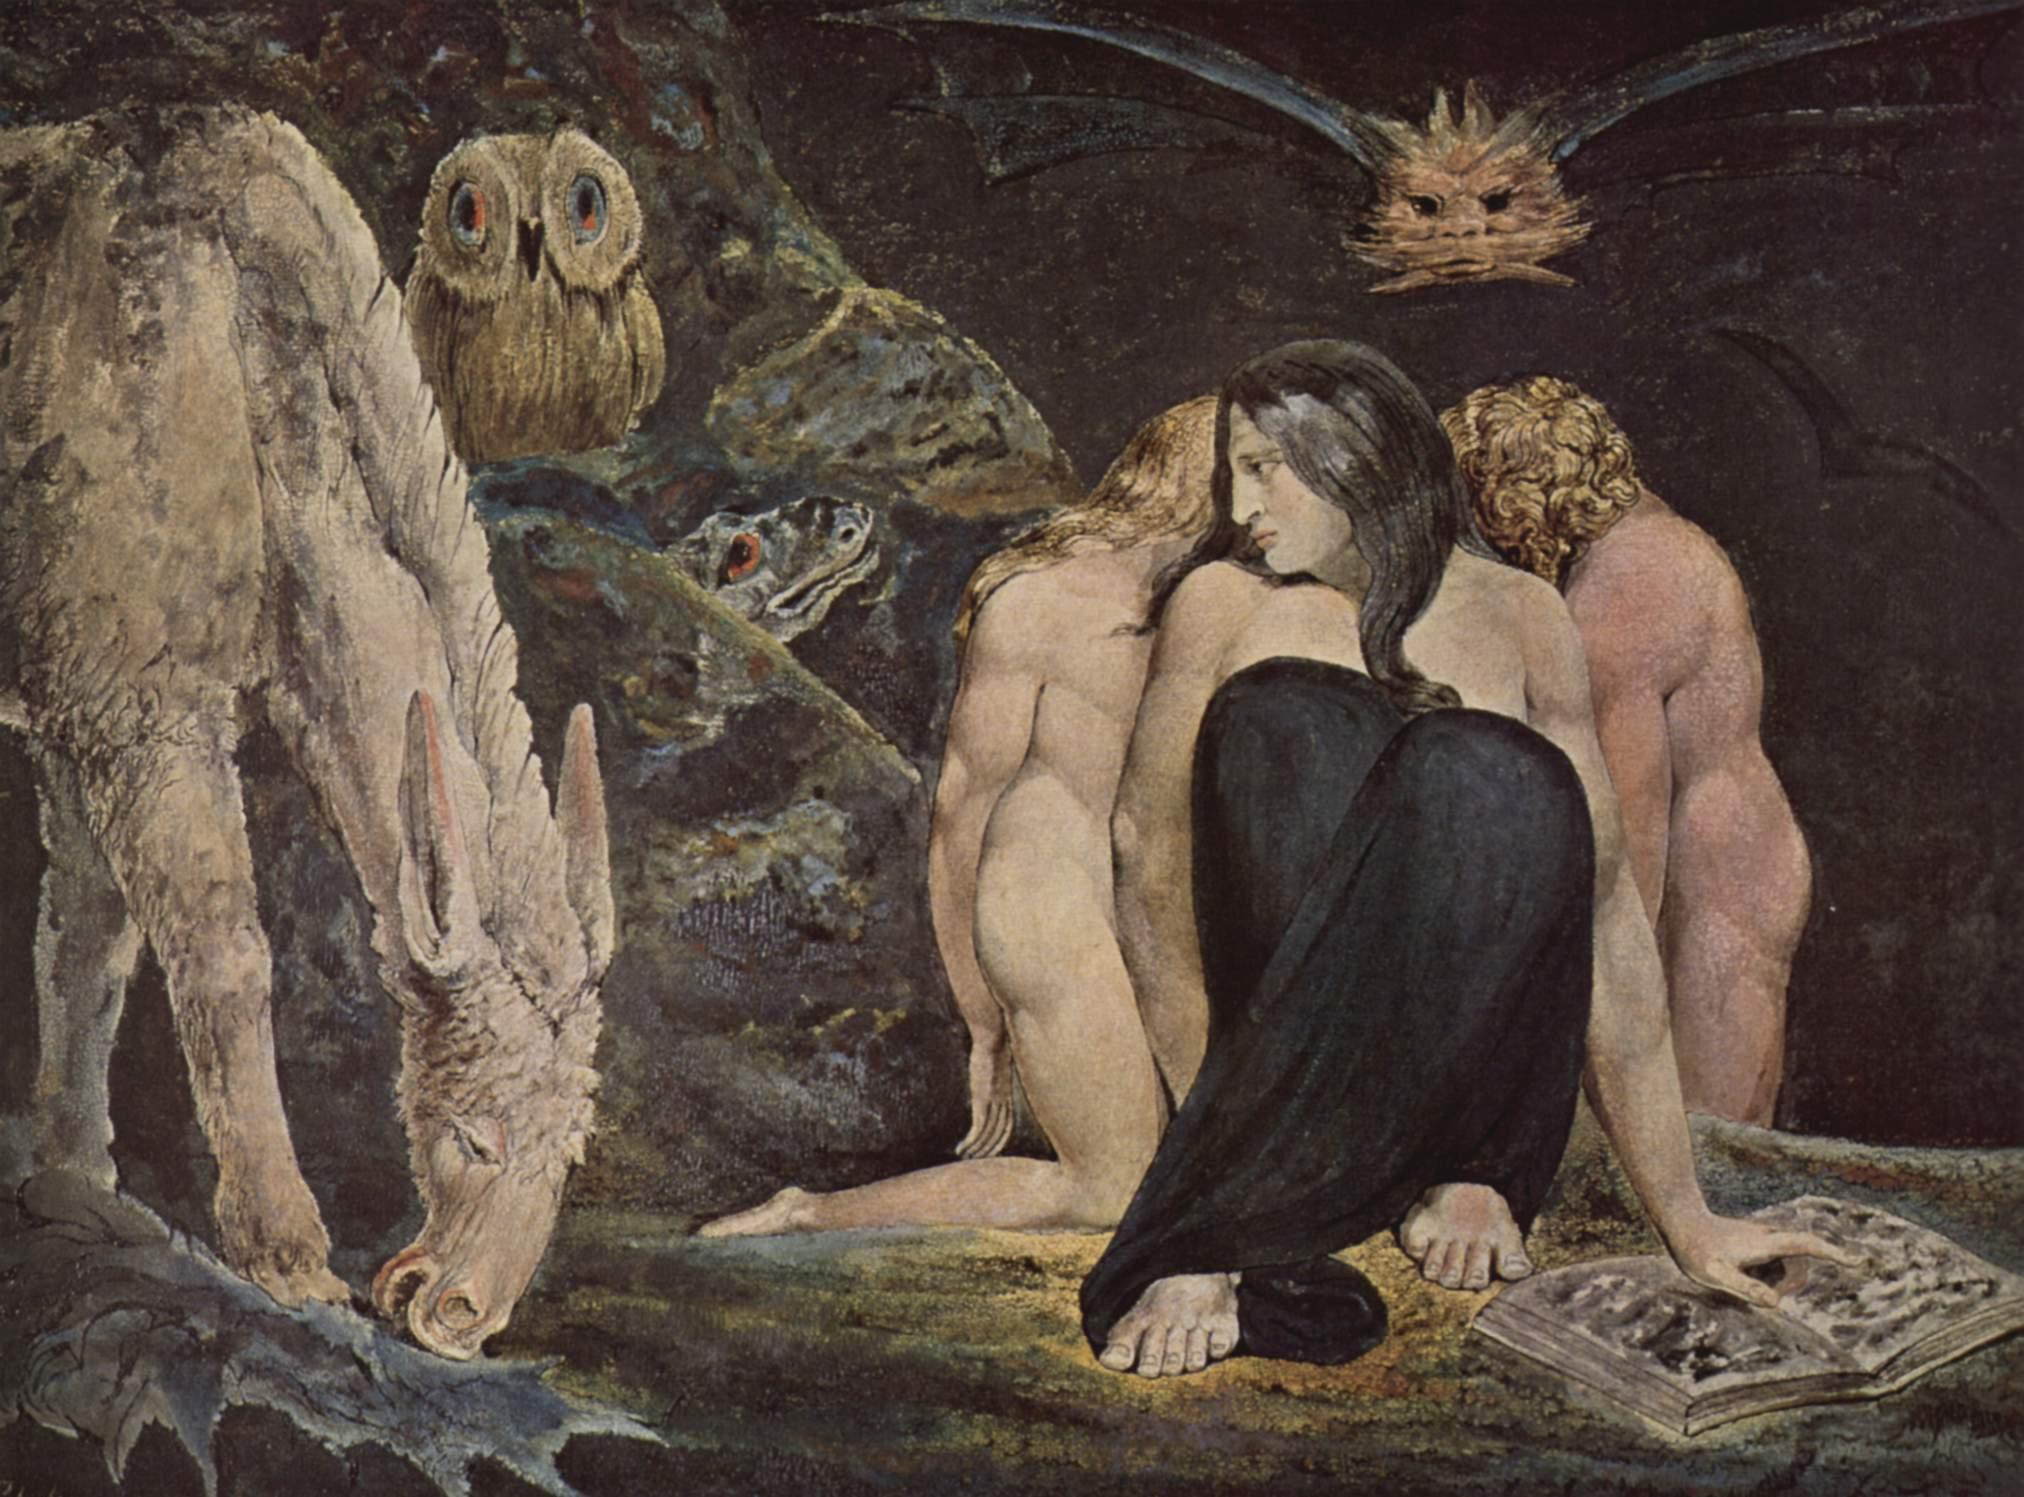 6. Hécate, William Blake, 1795